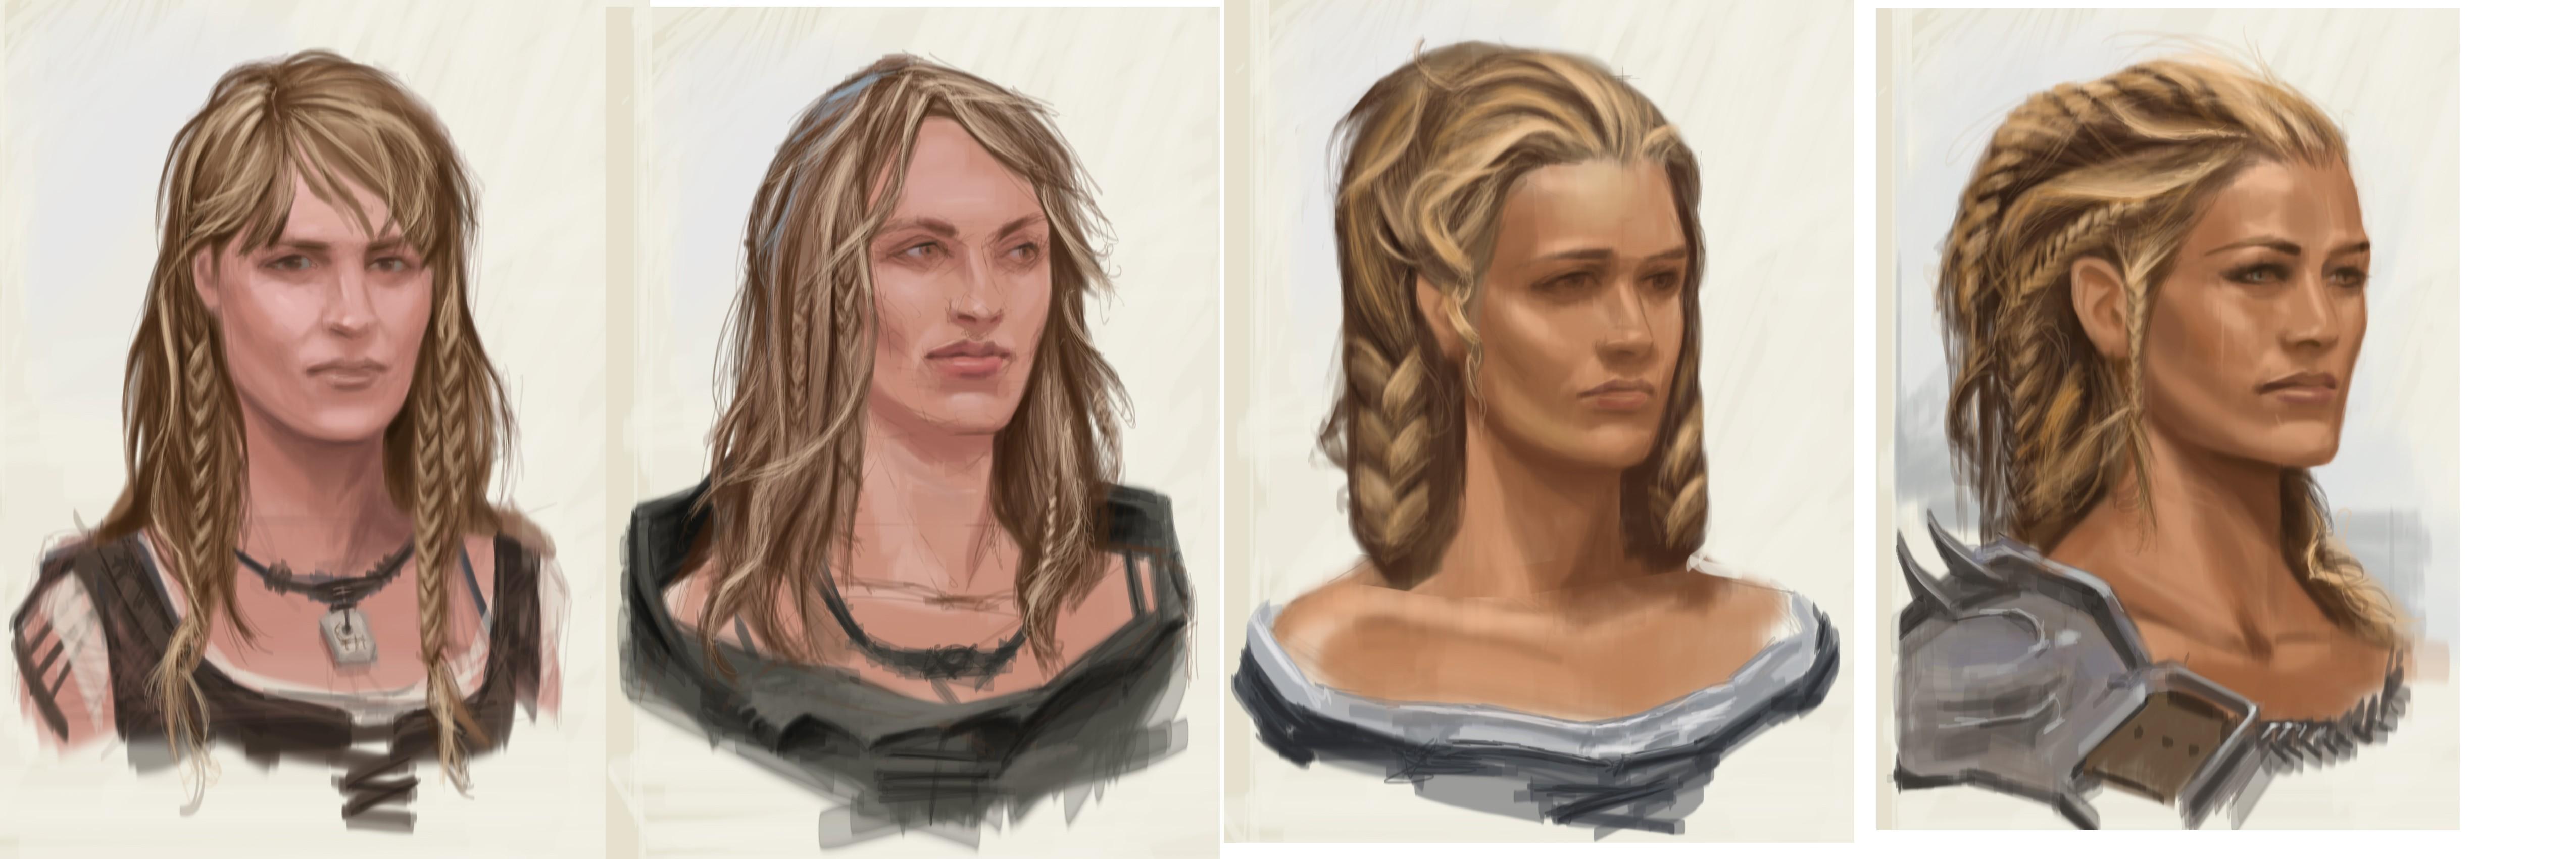 Nord_Female_Hair.jpg